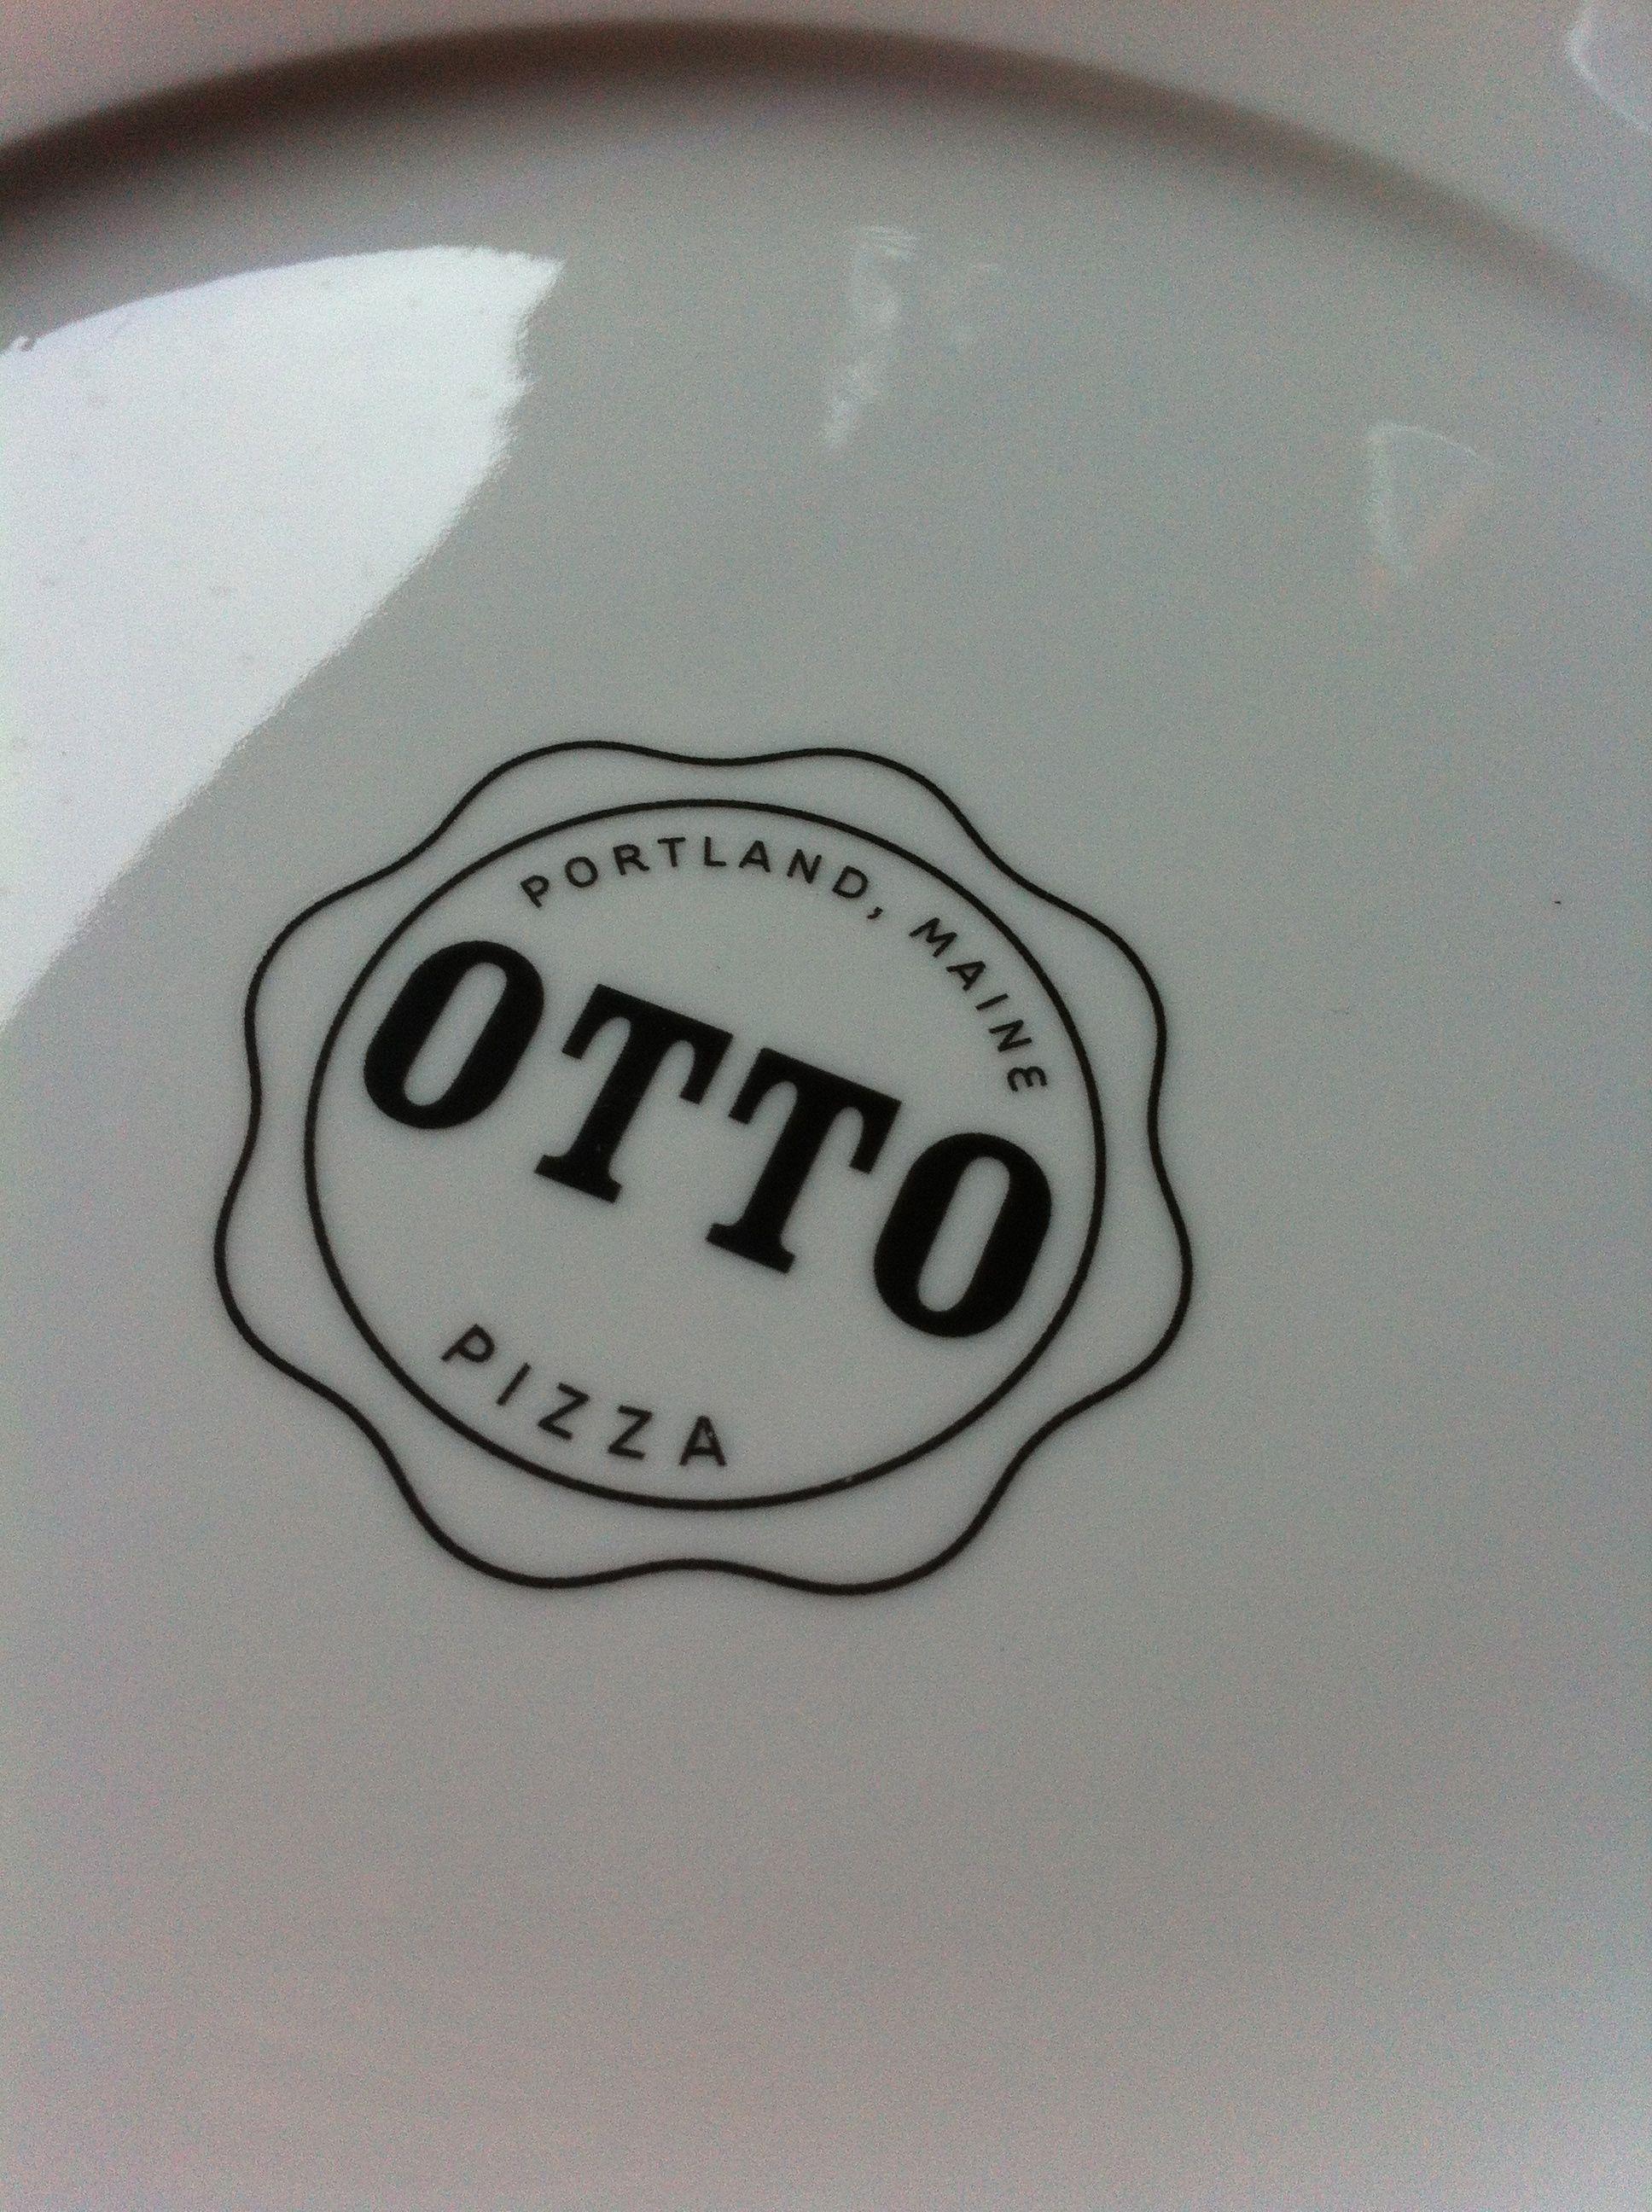 Otto portland restaurants maine portland